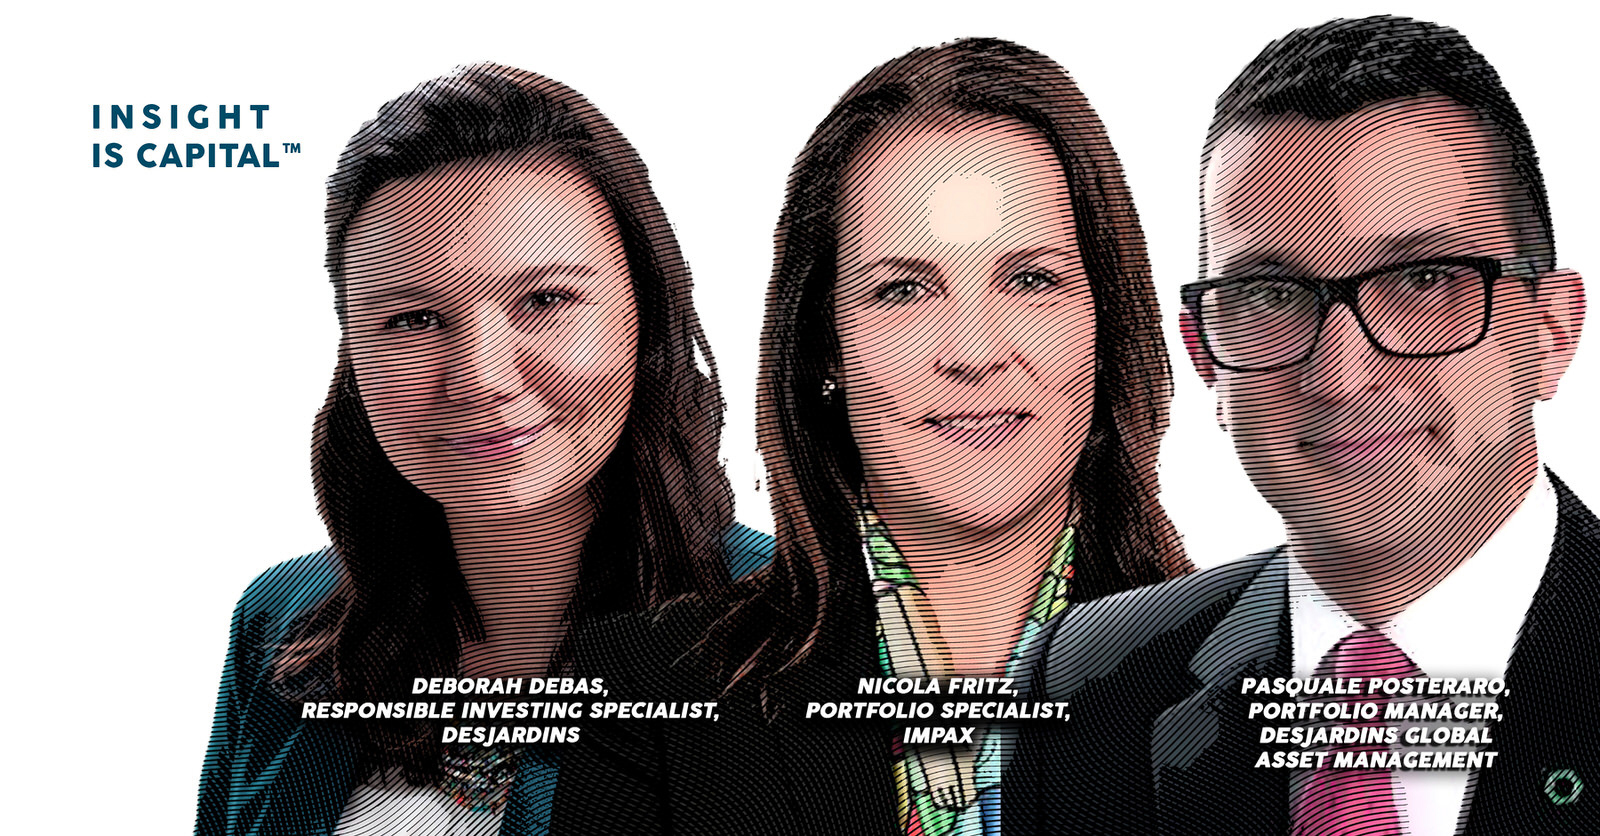 Insight is Capital Ep. 67 Deborah Debas, Pasquale Posteraro, and Nicola Fritz